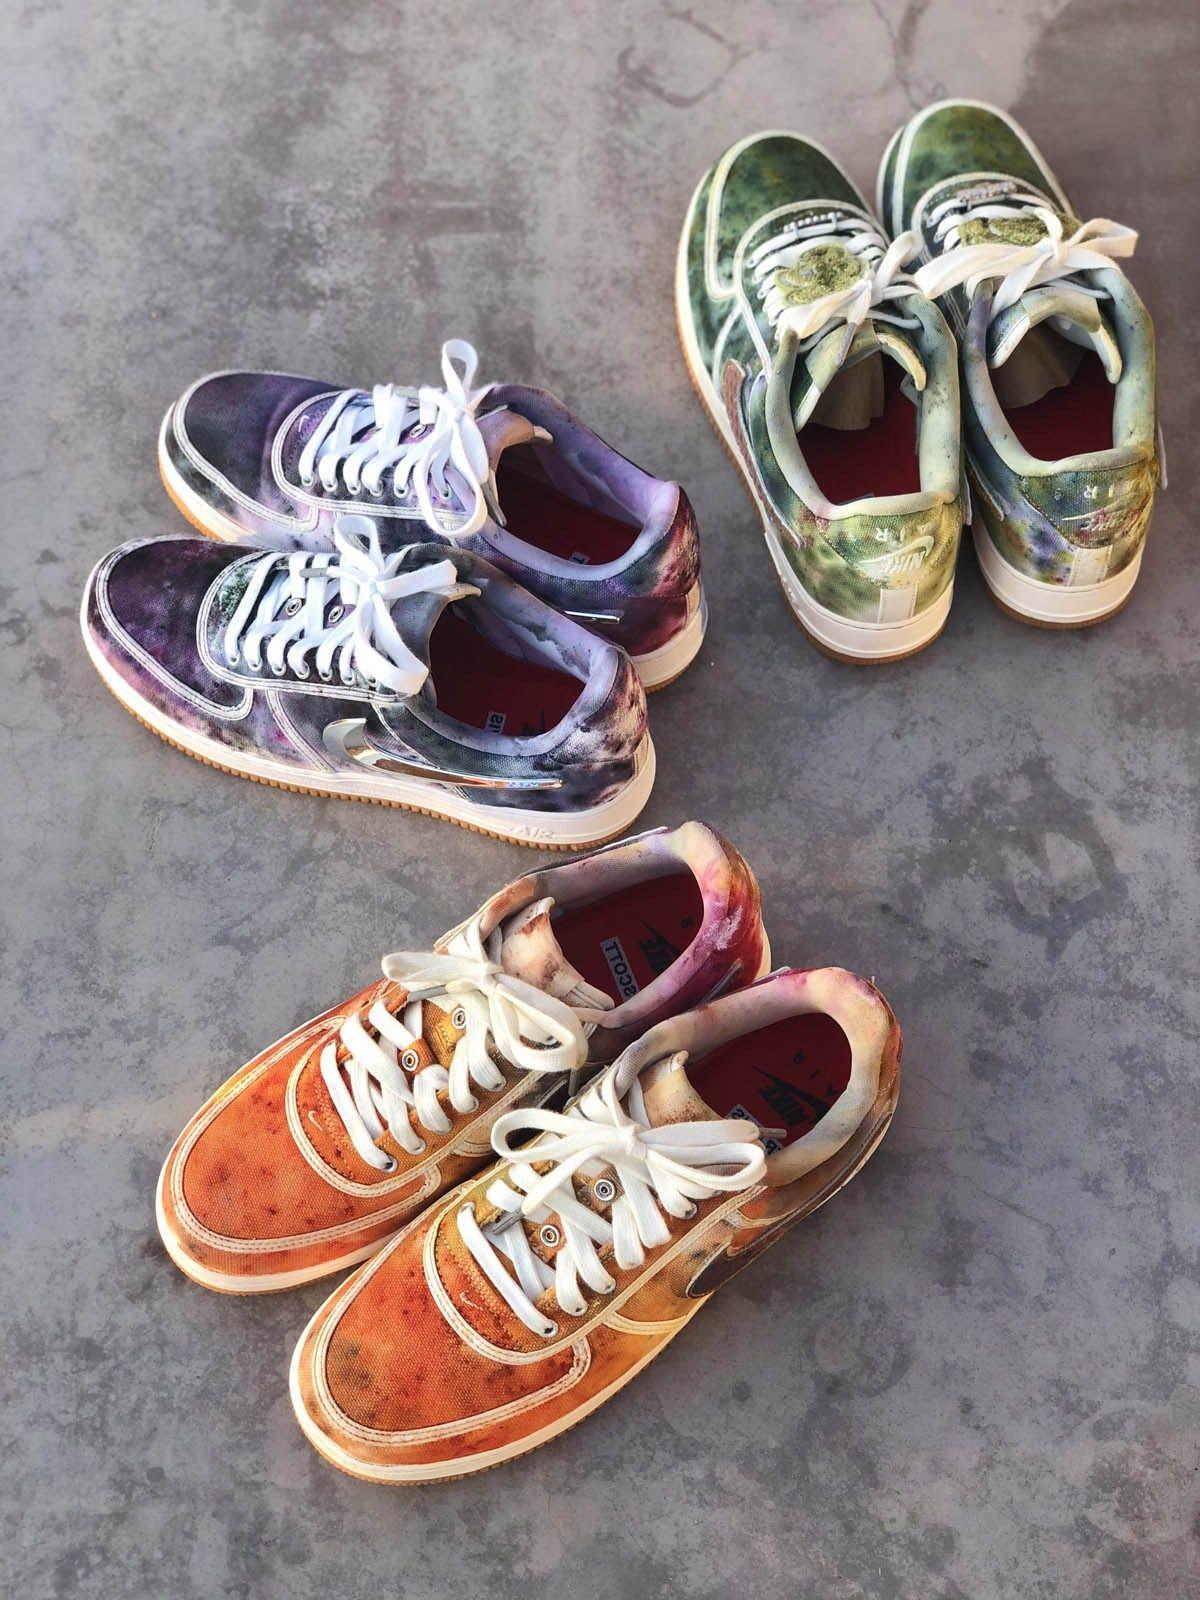 competitive price 3677c c6152 Joey Hamilton Gives Tie Dye Update To Travis Scott Nike Air Force 1   Nice  Kicks